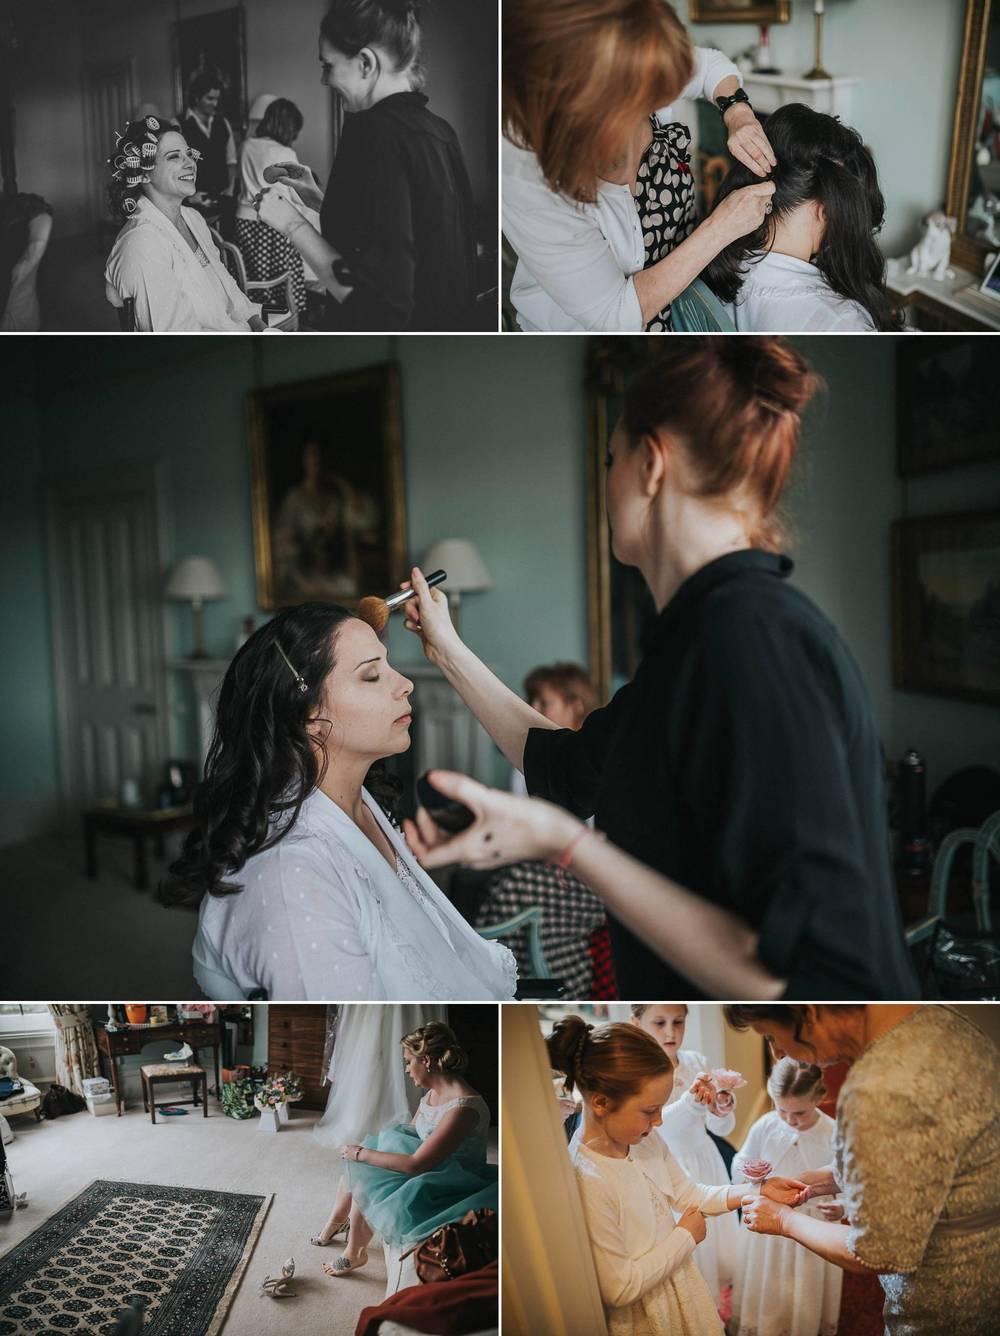 wedding-photographer-staffordshire 6.jpg